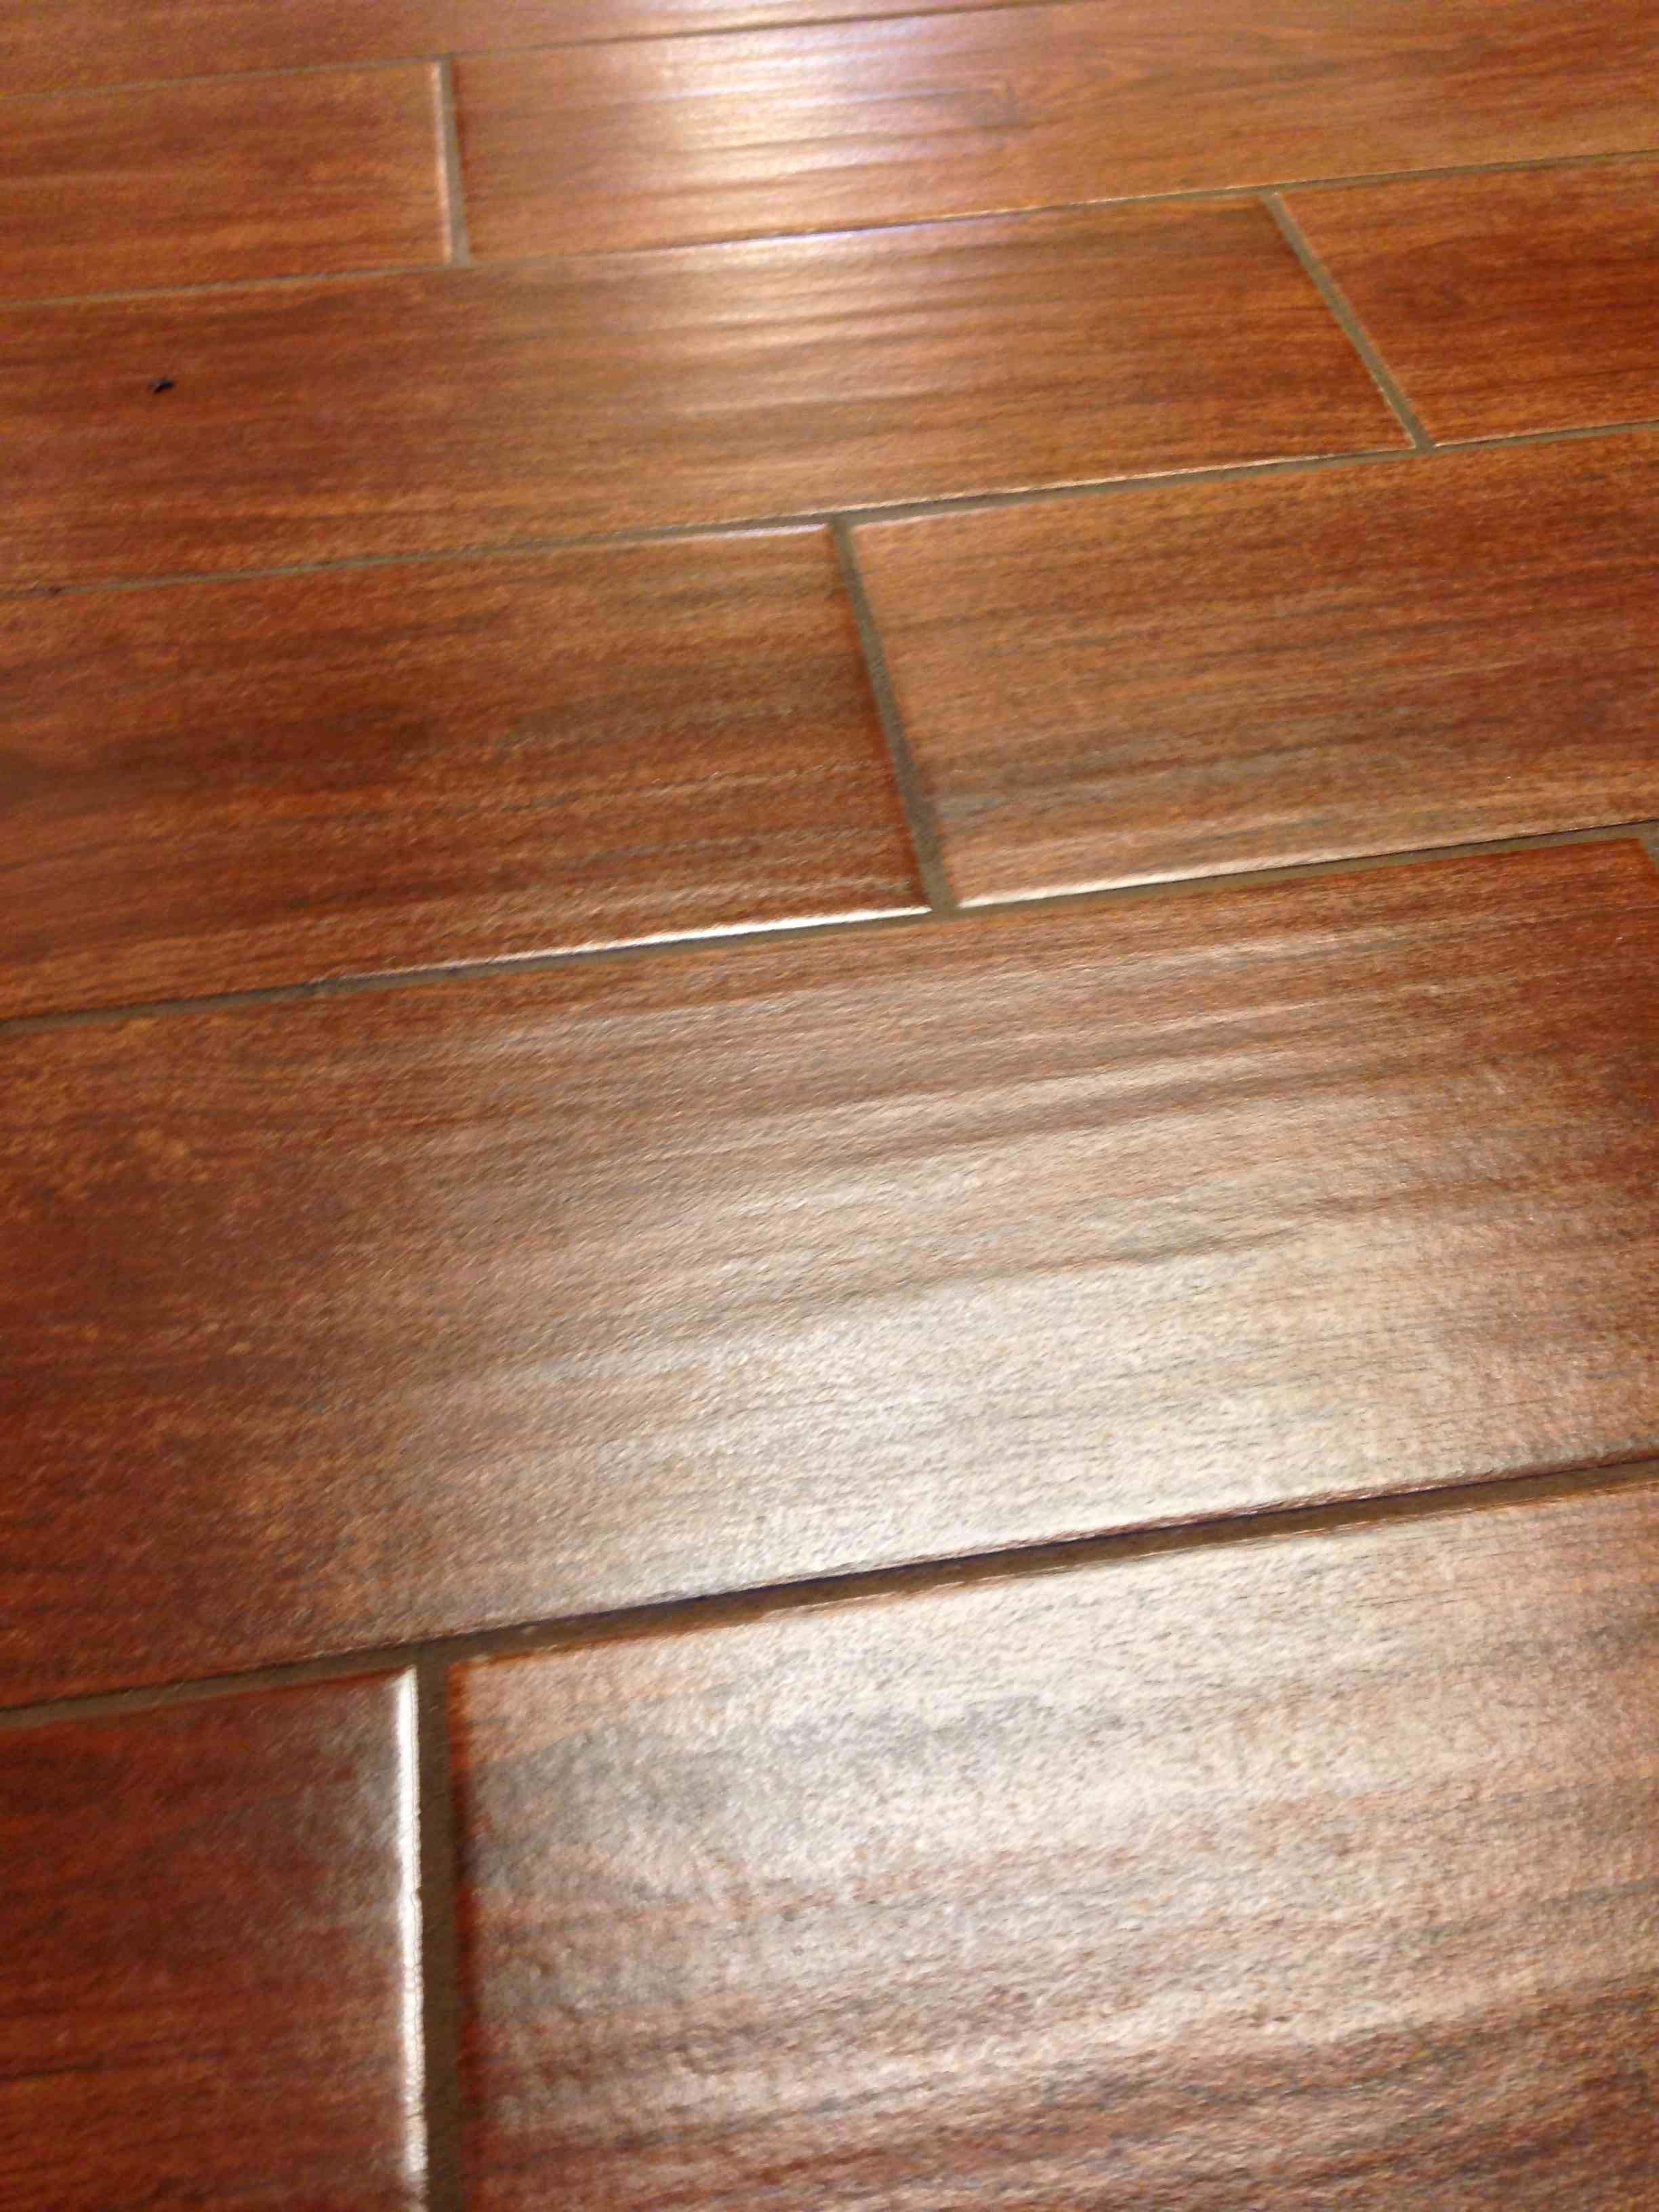 prefinished white oak hardwood flooring of prefinished flooring rift quarter sawn white oak long length made in with regard to harwood flooring best tile that looks like hardwood floors elegant i pinimg 736x 0d 7b